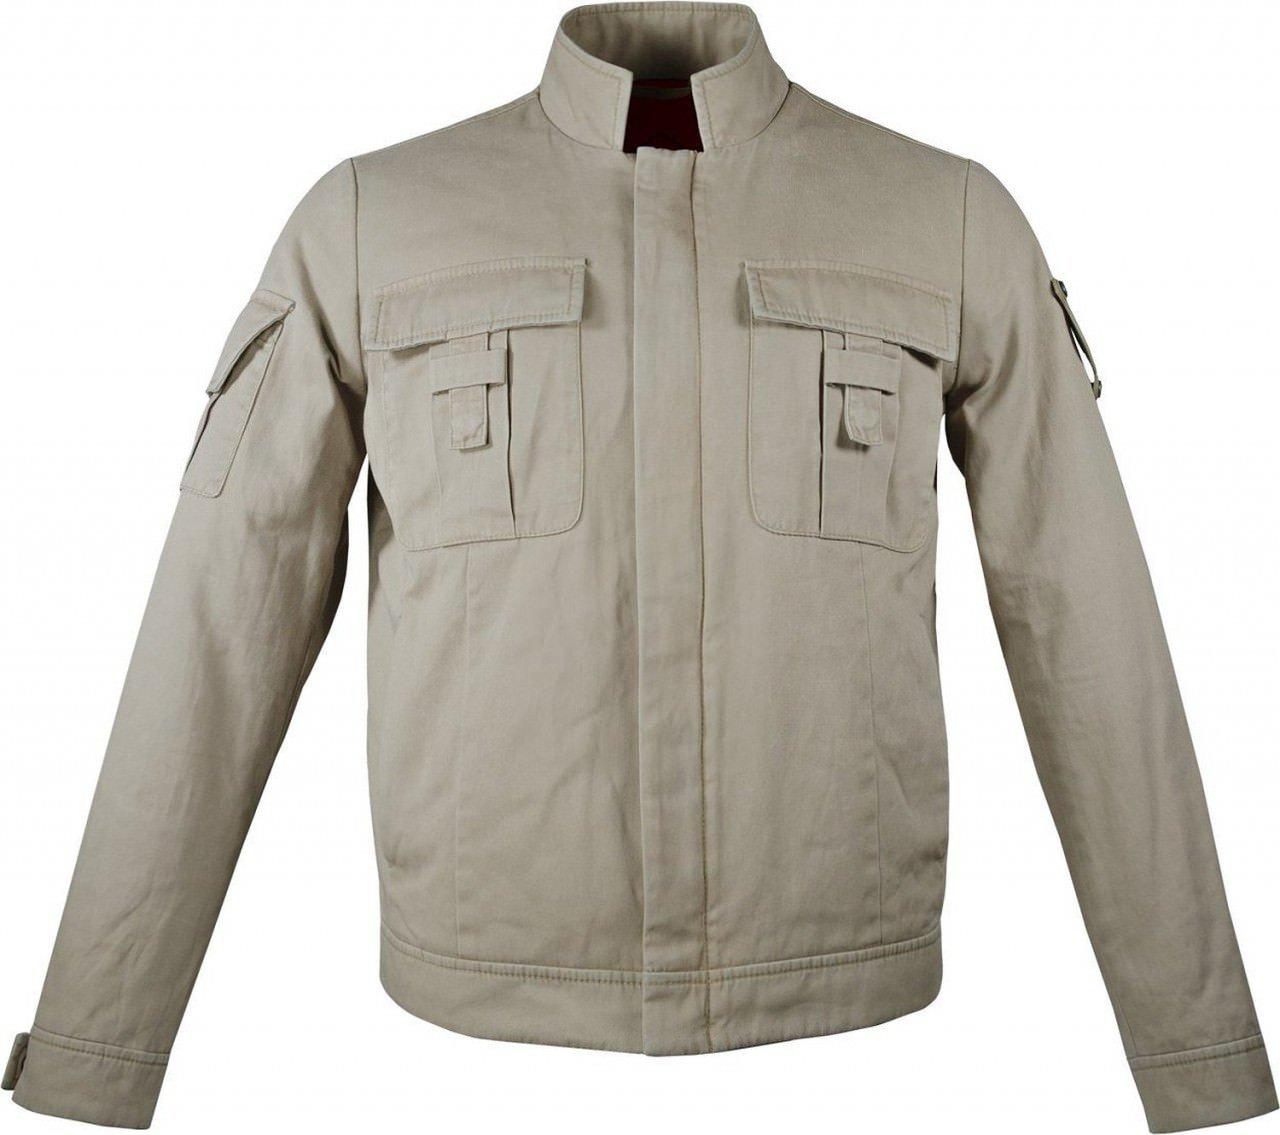 Mens Luke Skywalker Cotton Jacket - Light Summer Jacket | Beige Luke Skywalker Jacket, L